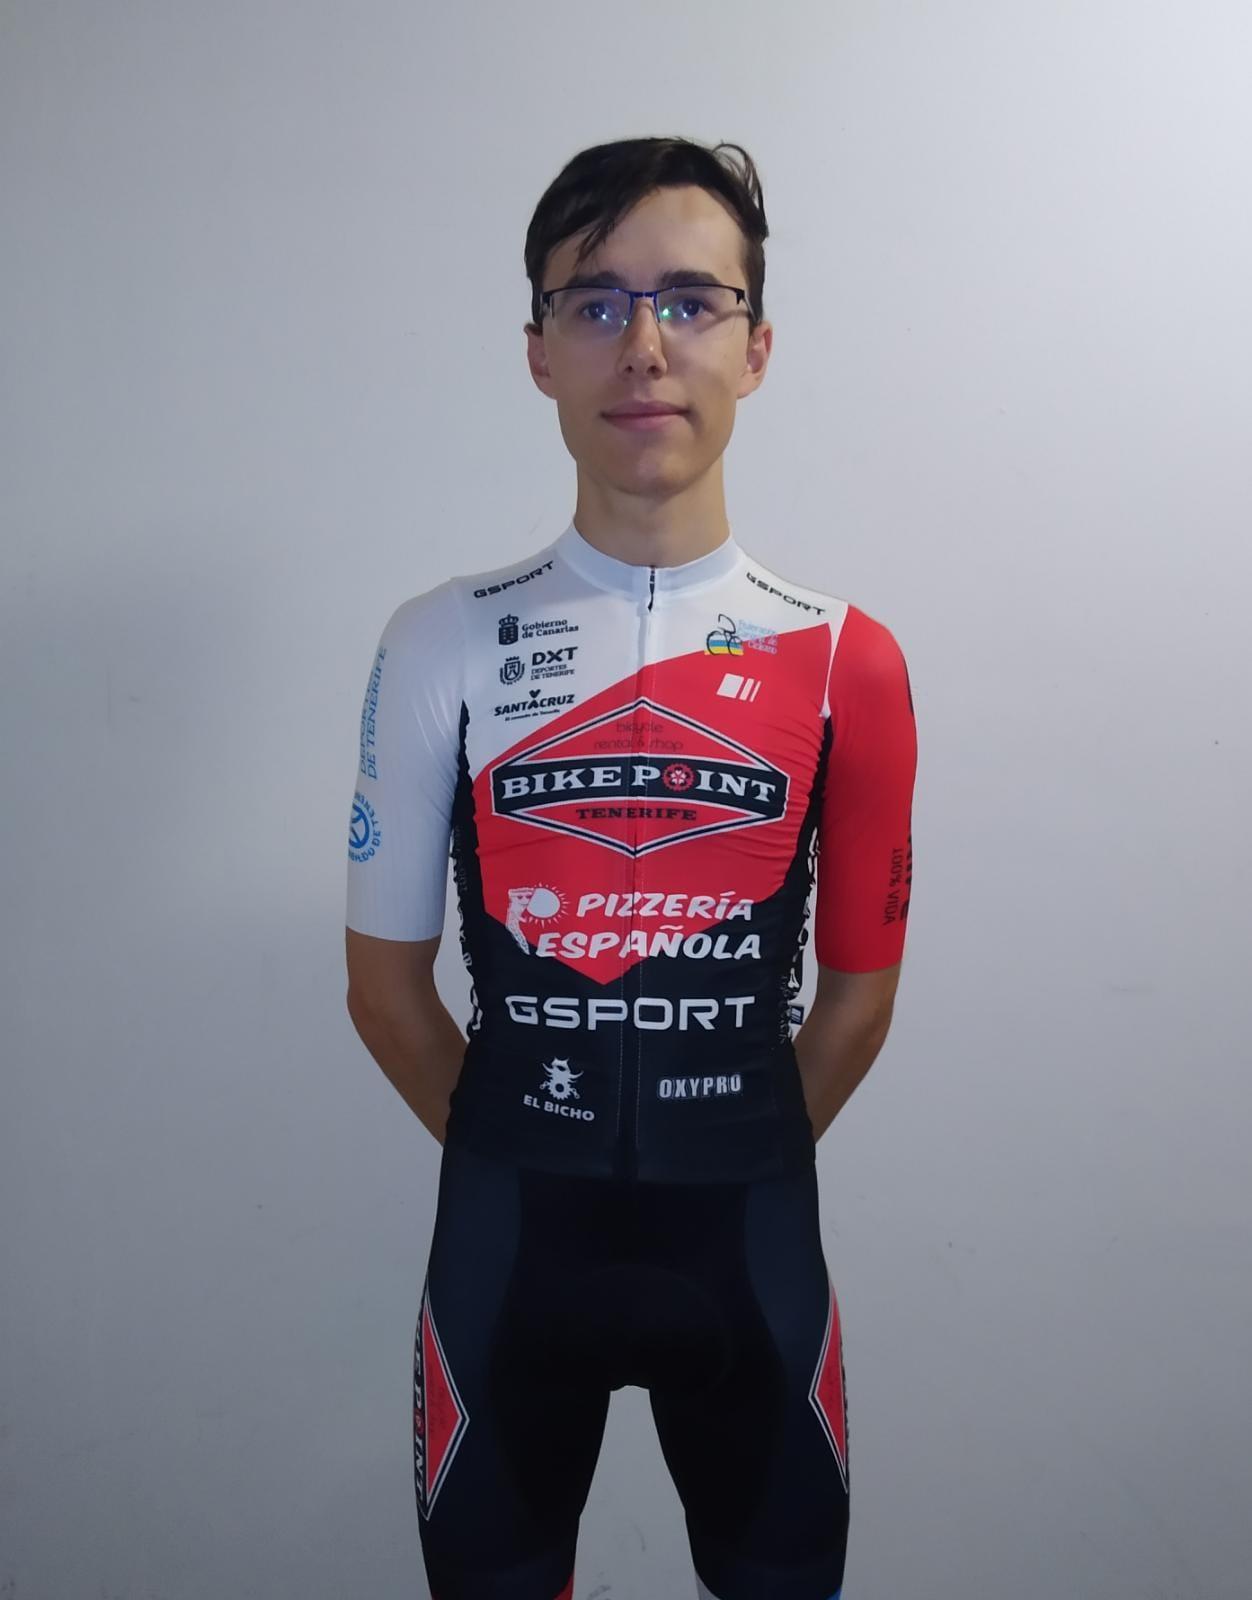 José Carlos Yagüe Pelotón Tenerife